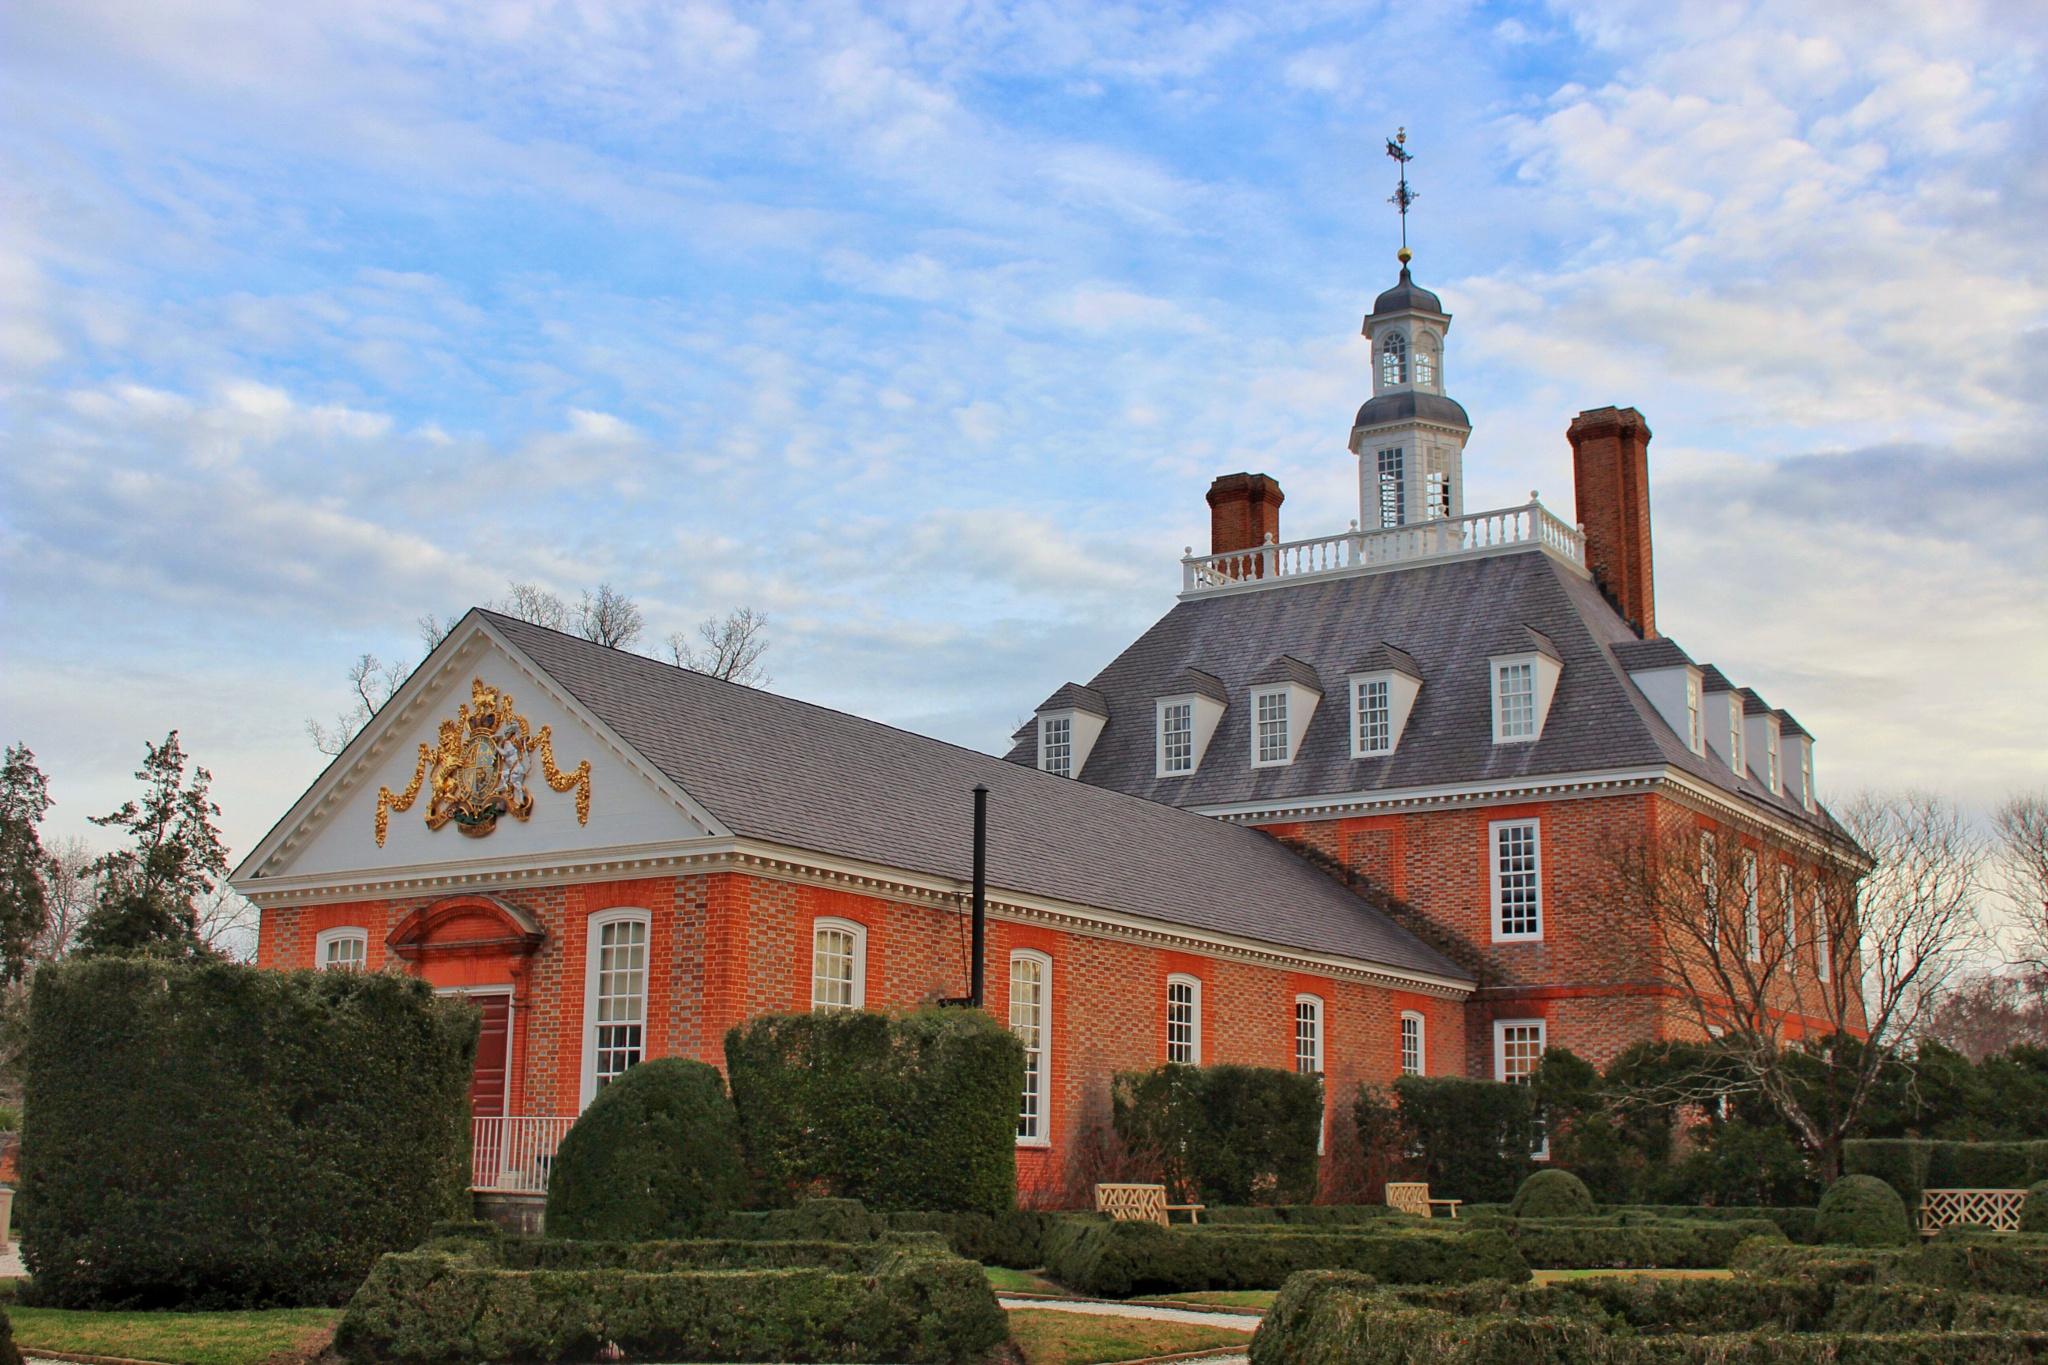 Governors masion, Williamsburg VA by Gerardo Barillas